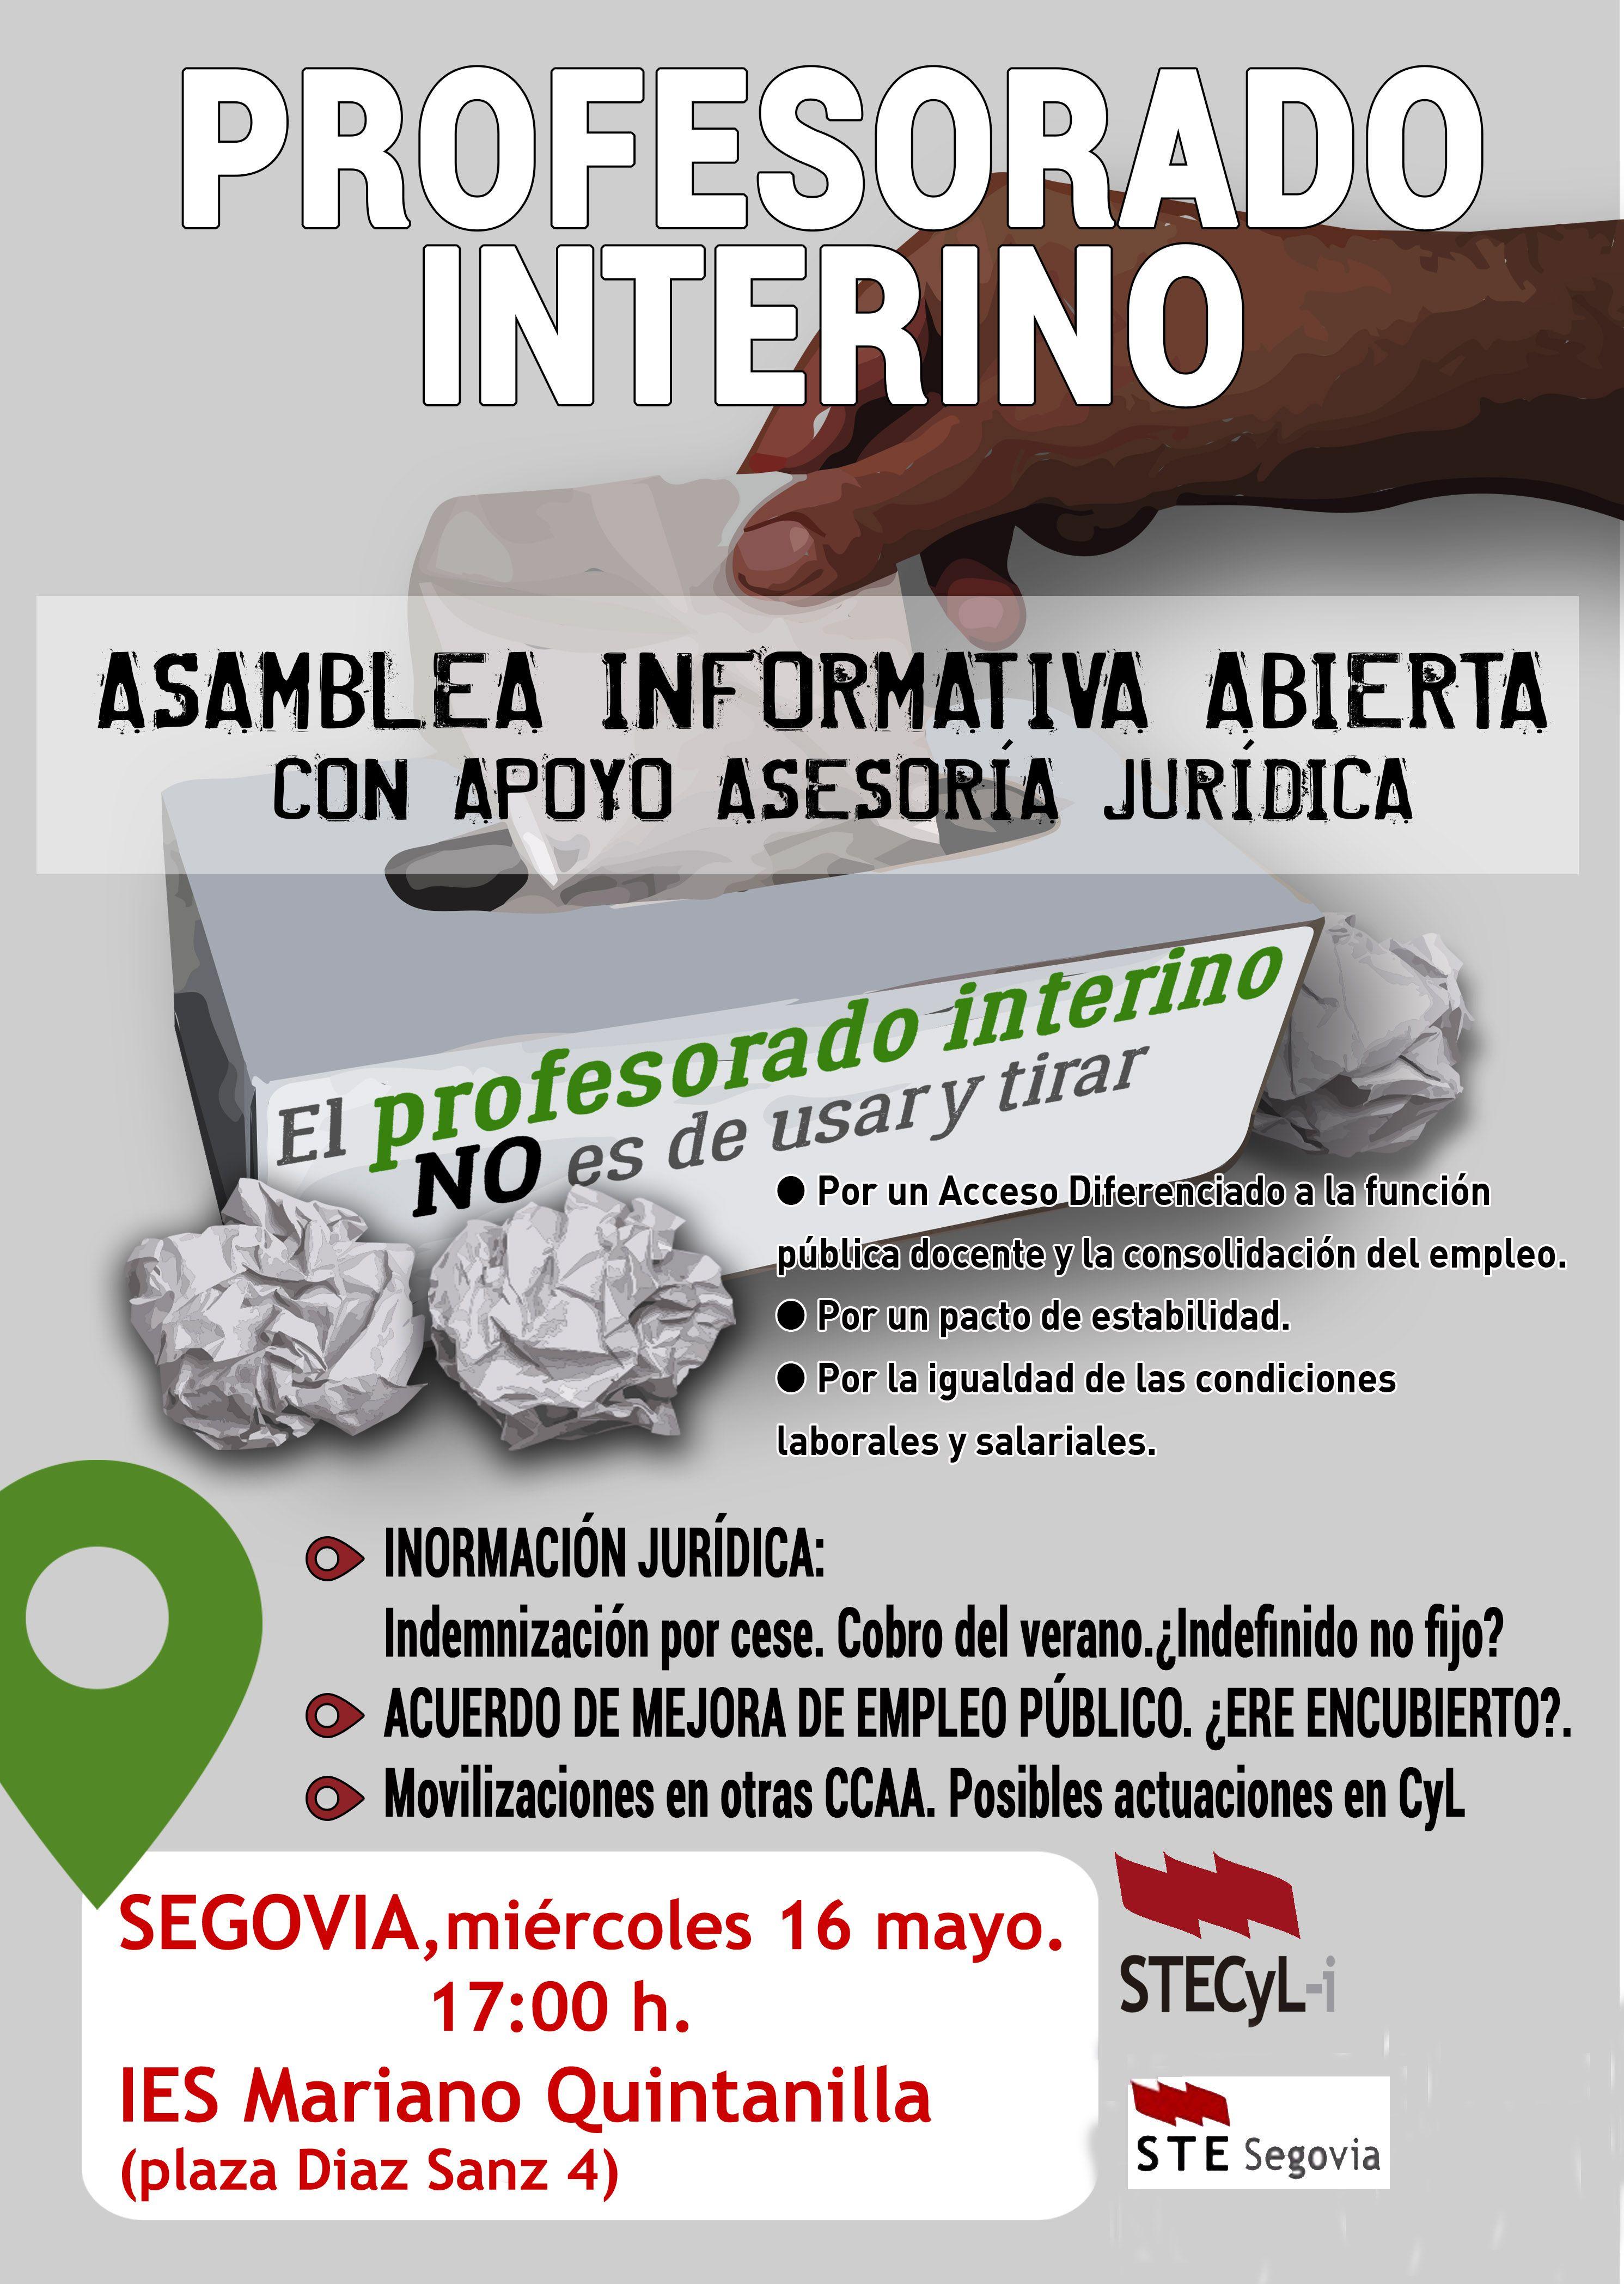 Cartel_ProfInterino_ASMABLEA-INFORMATIVA-SG